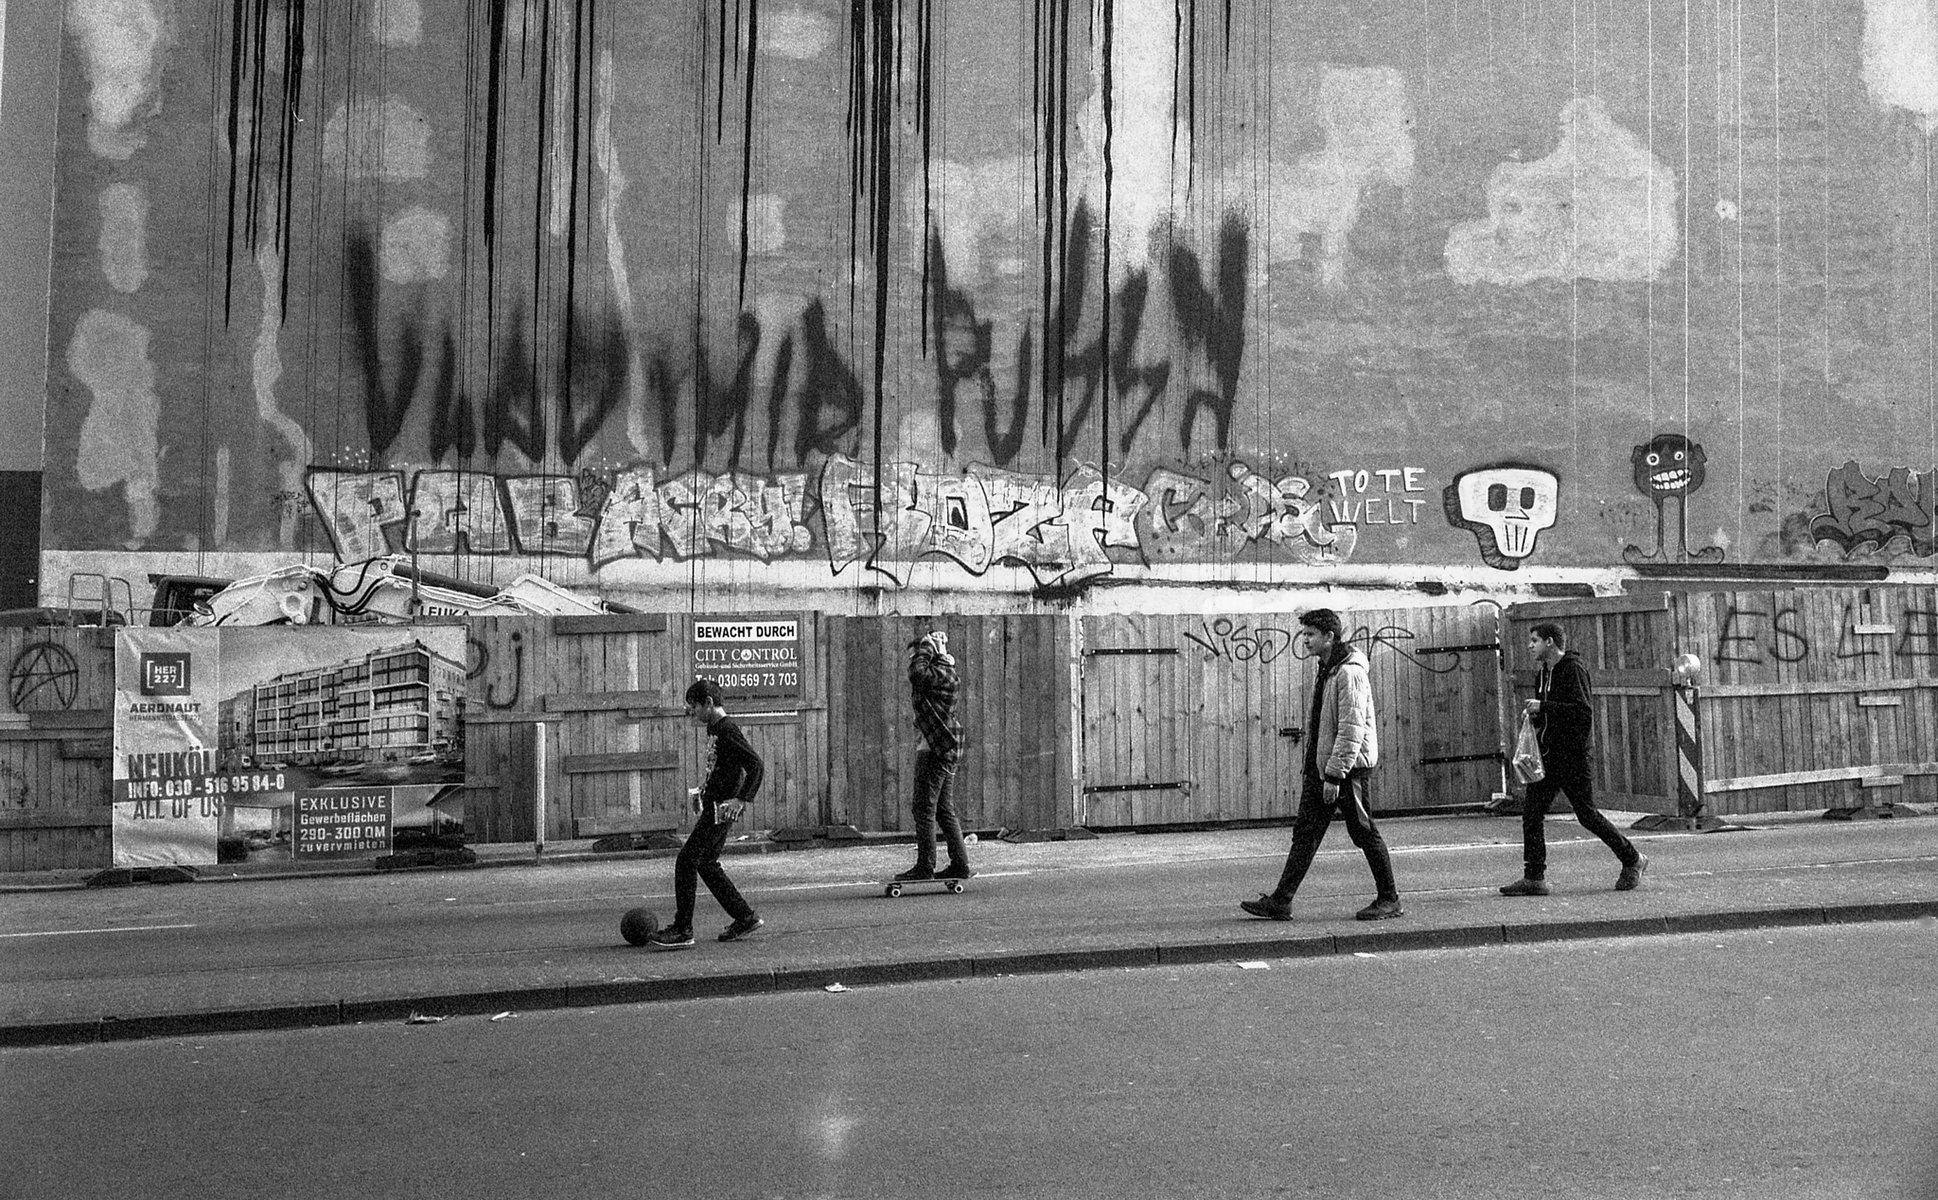 Jean-Pierre Damen urban and street photography - roll9_001.jpg